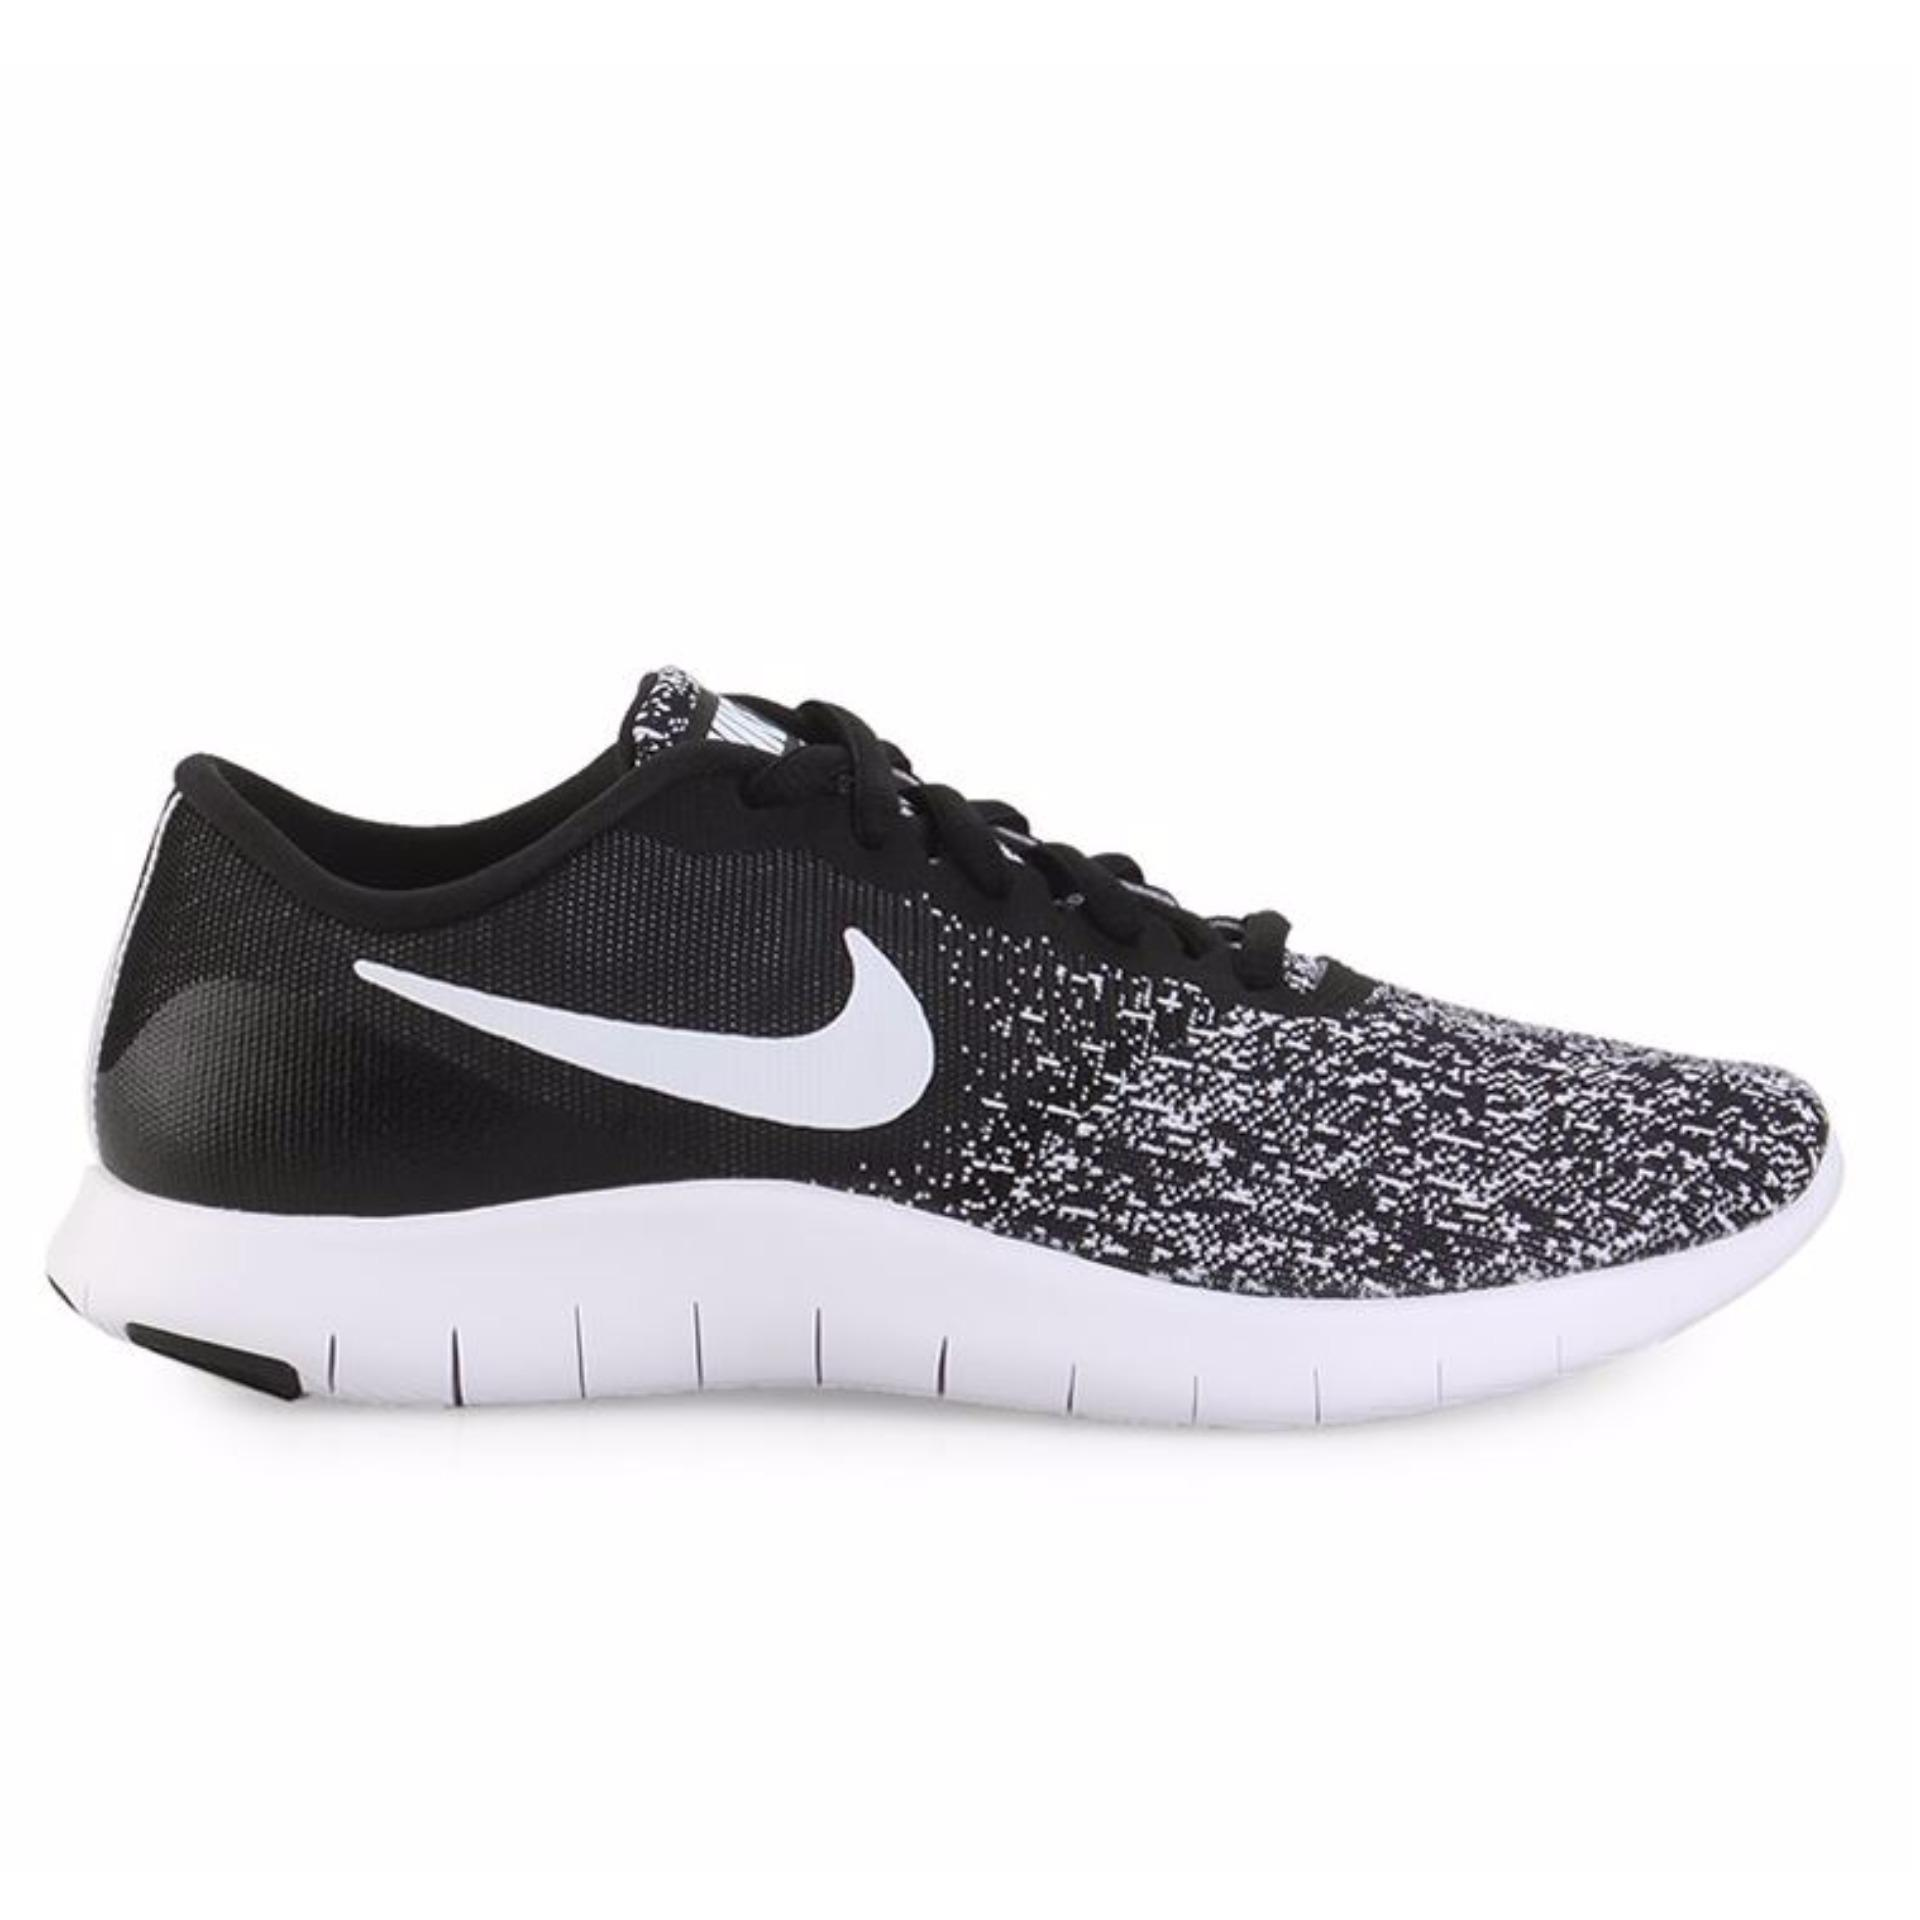 Nike Dualtone Racer Sepatu Wanita Hitam - Wikie Cloud Design Ideas 1699879f12